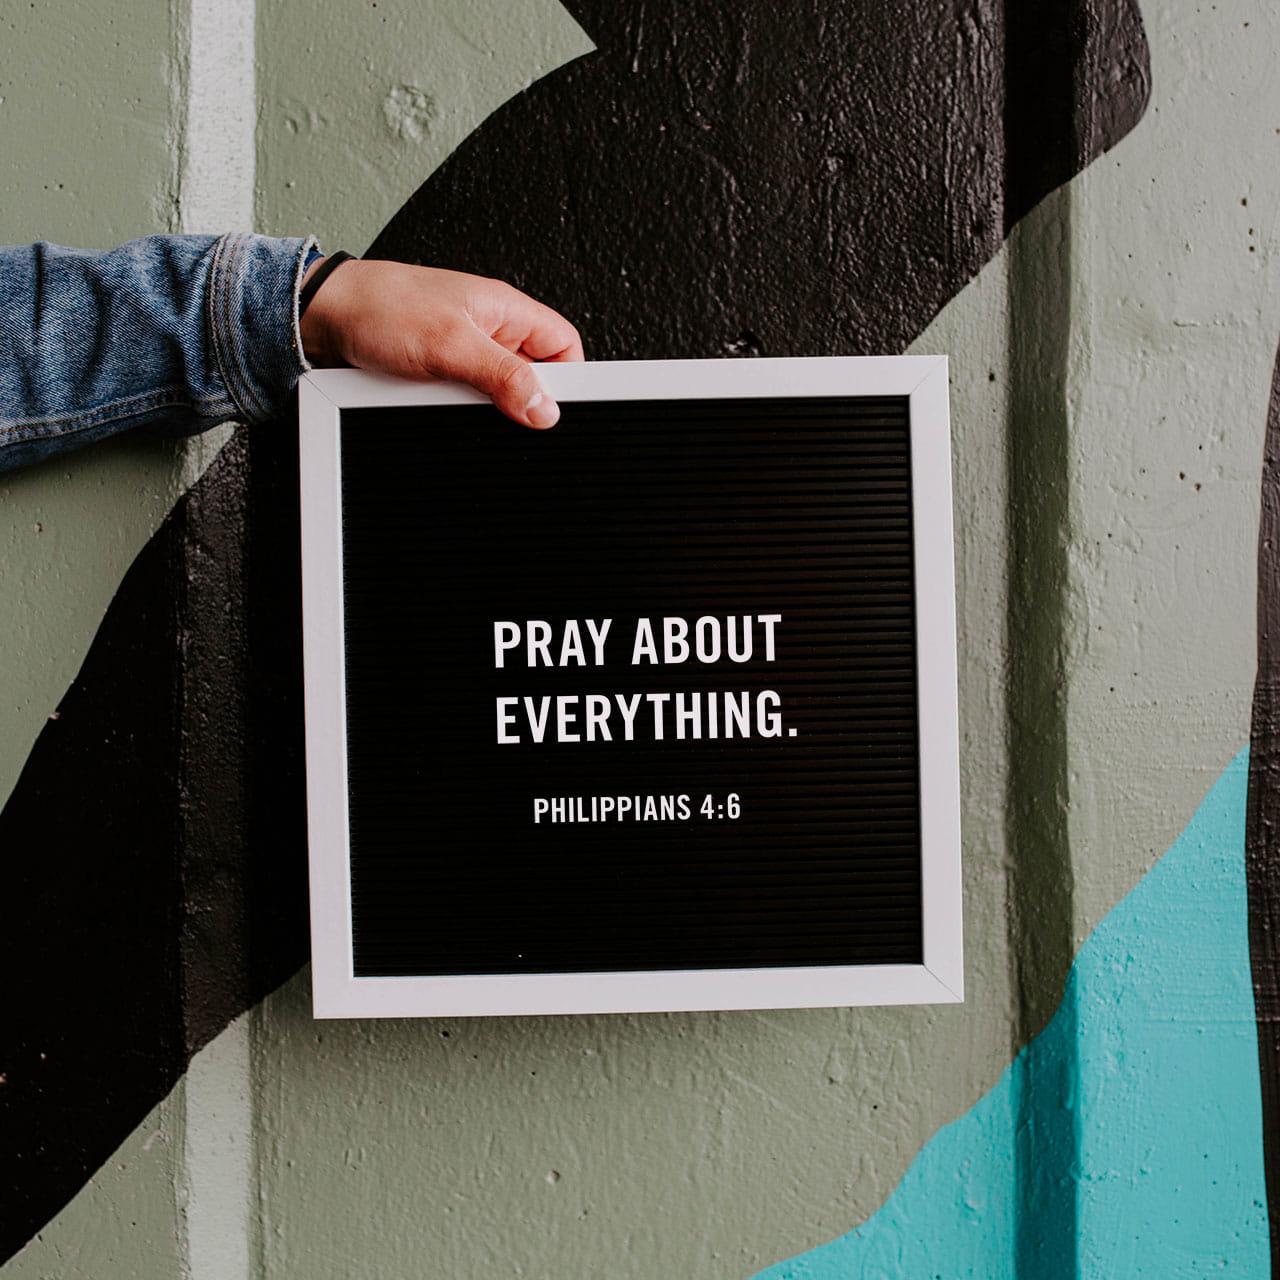 Prayer Guide: January 27th, 2020